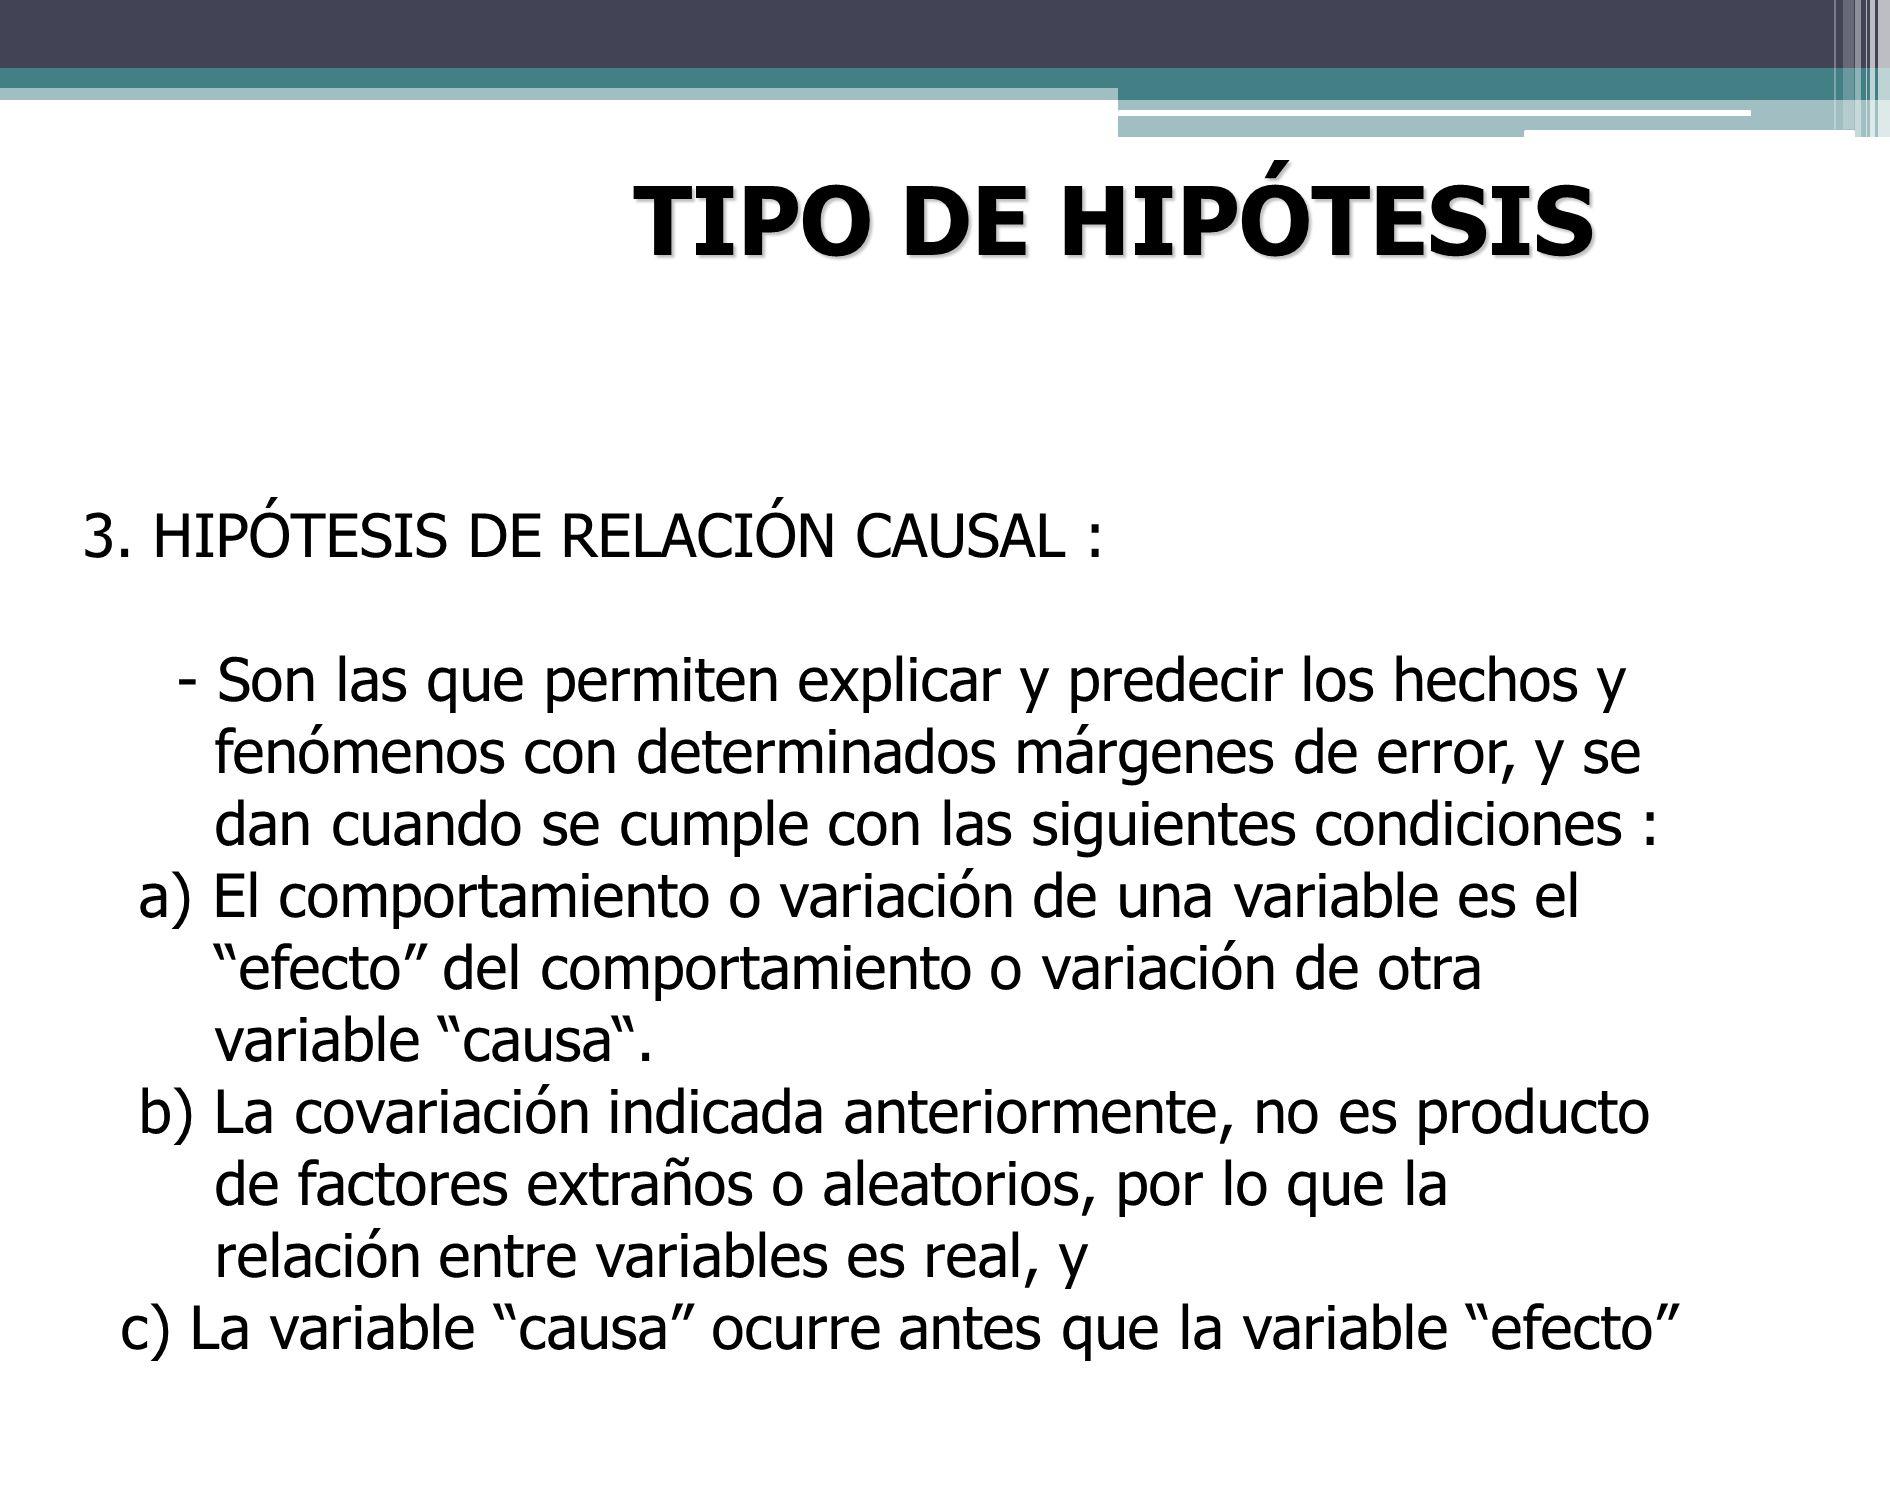 TIPO DE HIPÓTESIS 3. HIPÓTESIS DE RELACIÓN CAUSAL :